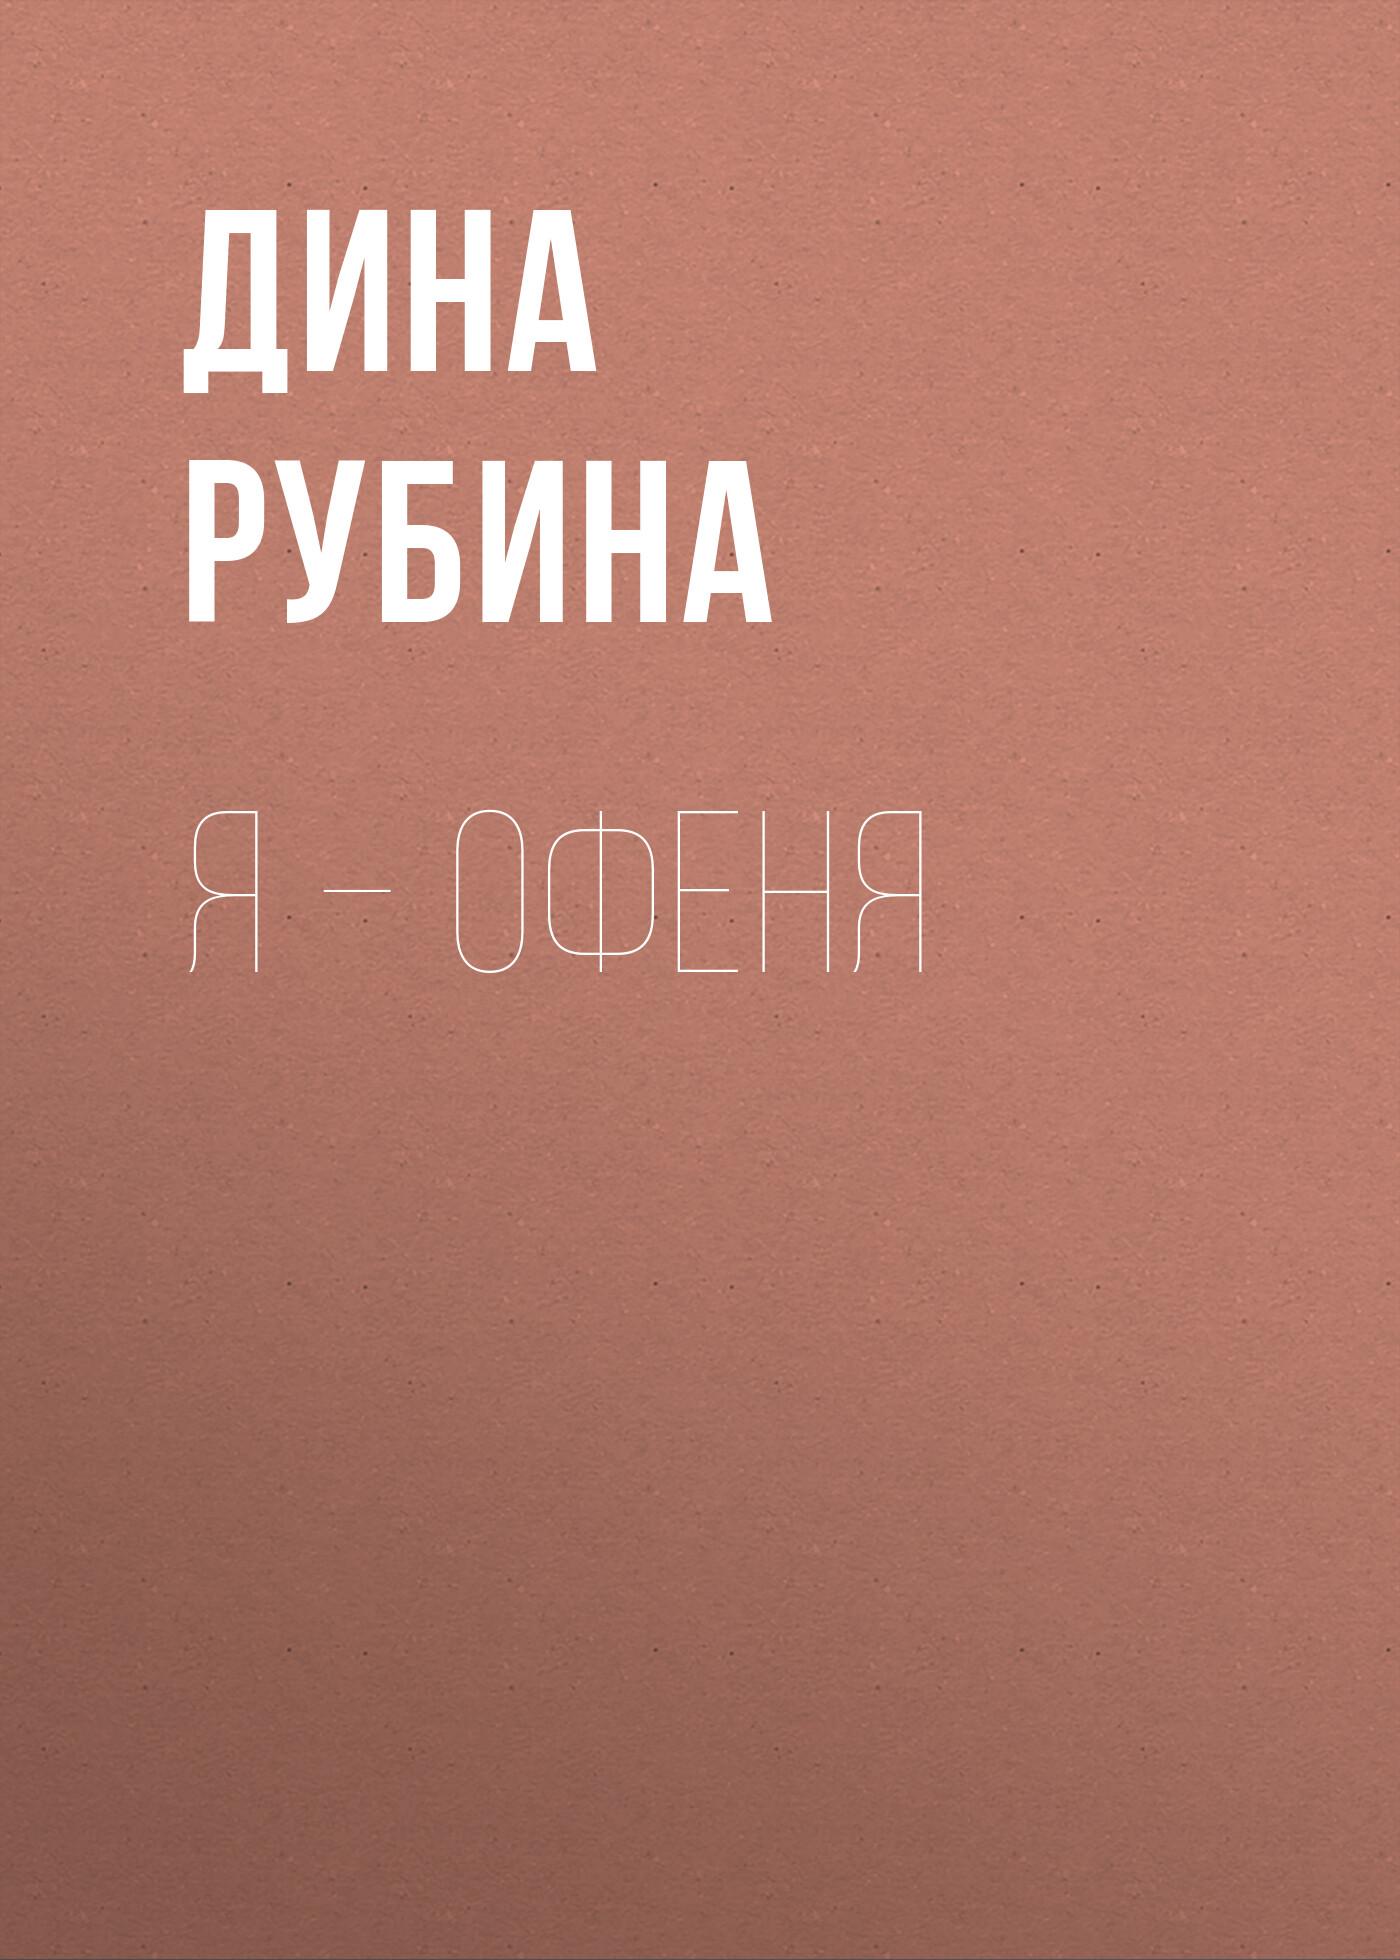 Дина Рубина Я – офеня рубина дина ильинична белая голубка кордовы